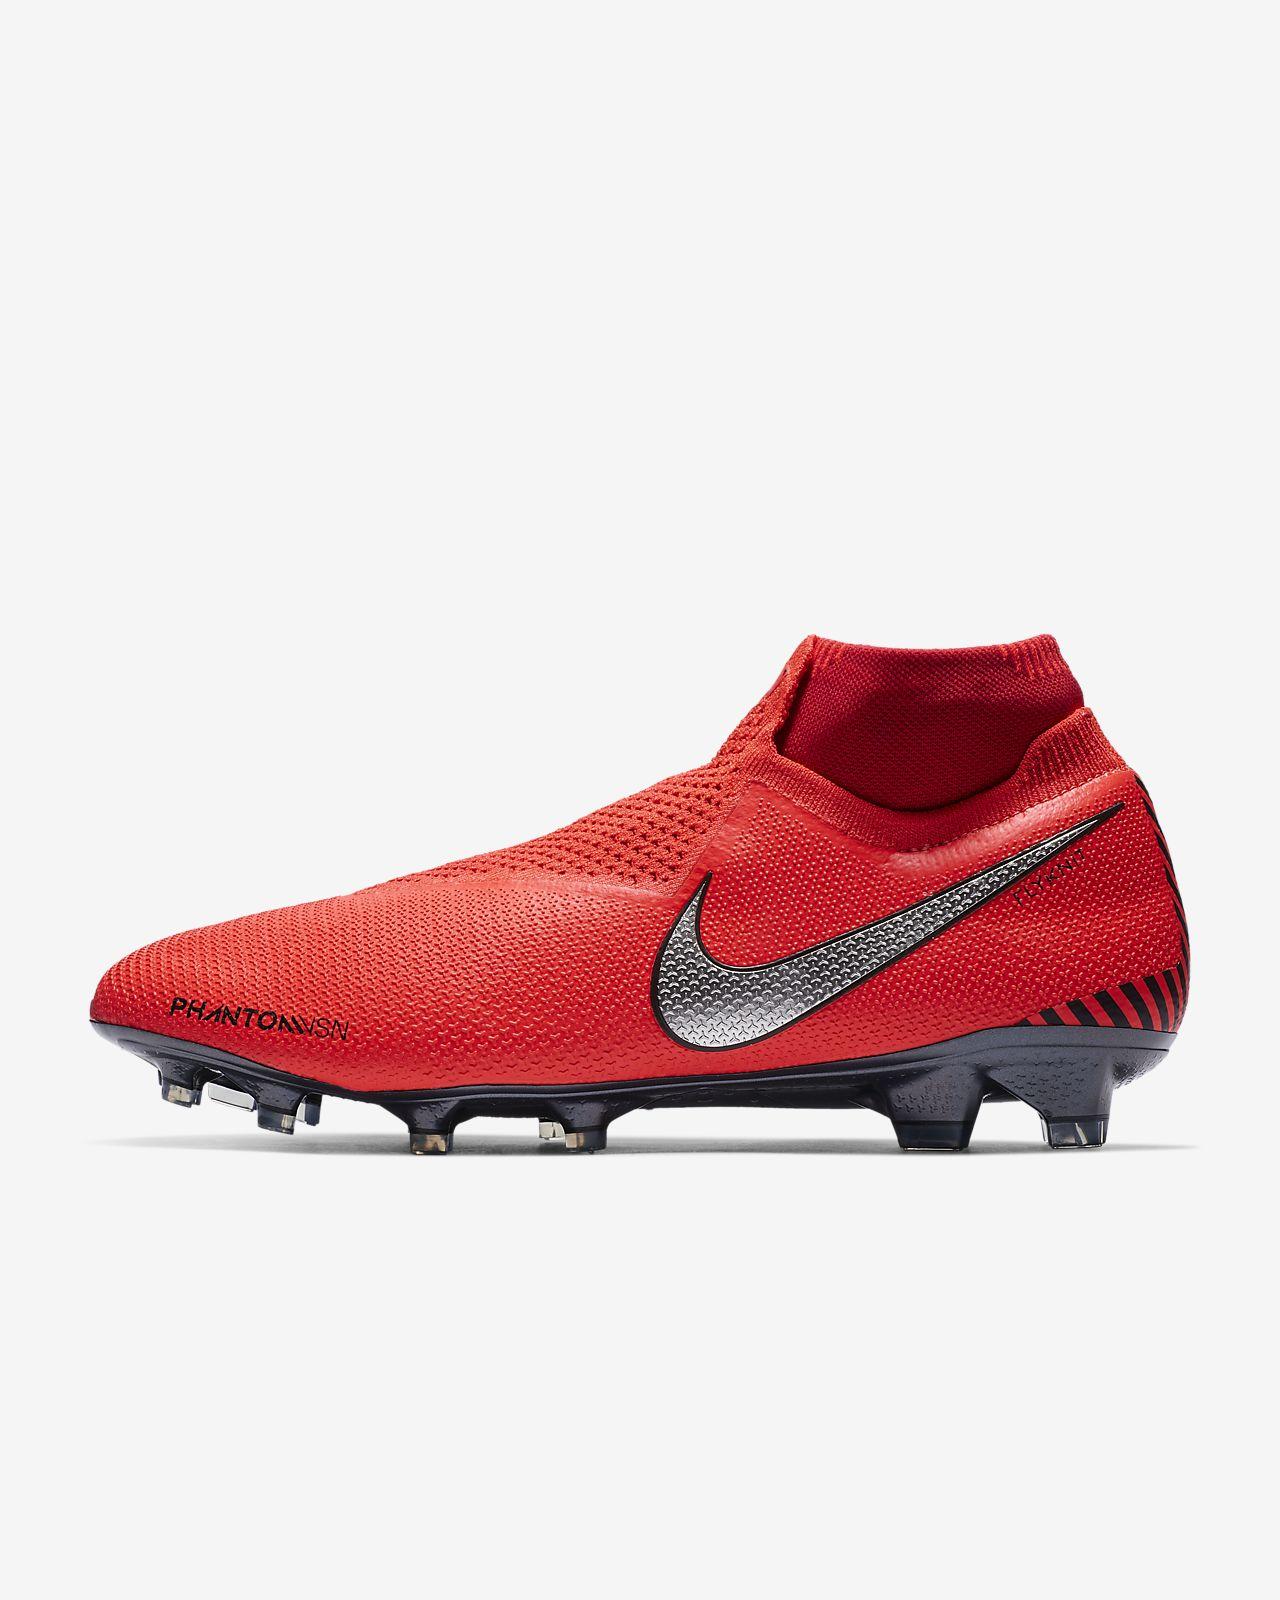 Chuteiras de futebol para terreno firme Nike PhantomVSN Elite Dynamic Fit  Game Over FG 0c2a7951d55fd